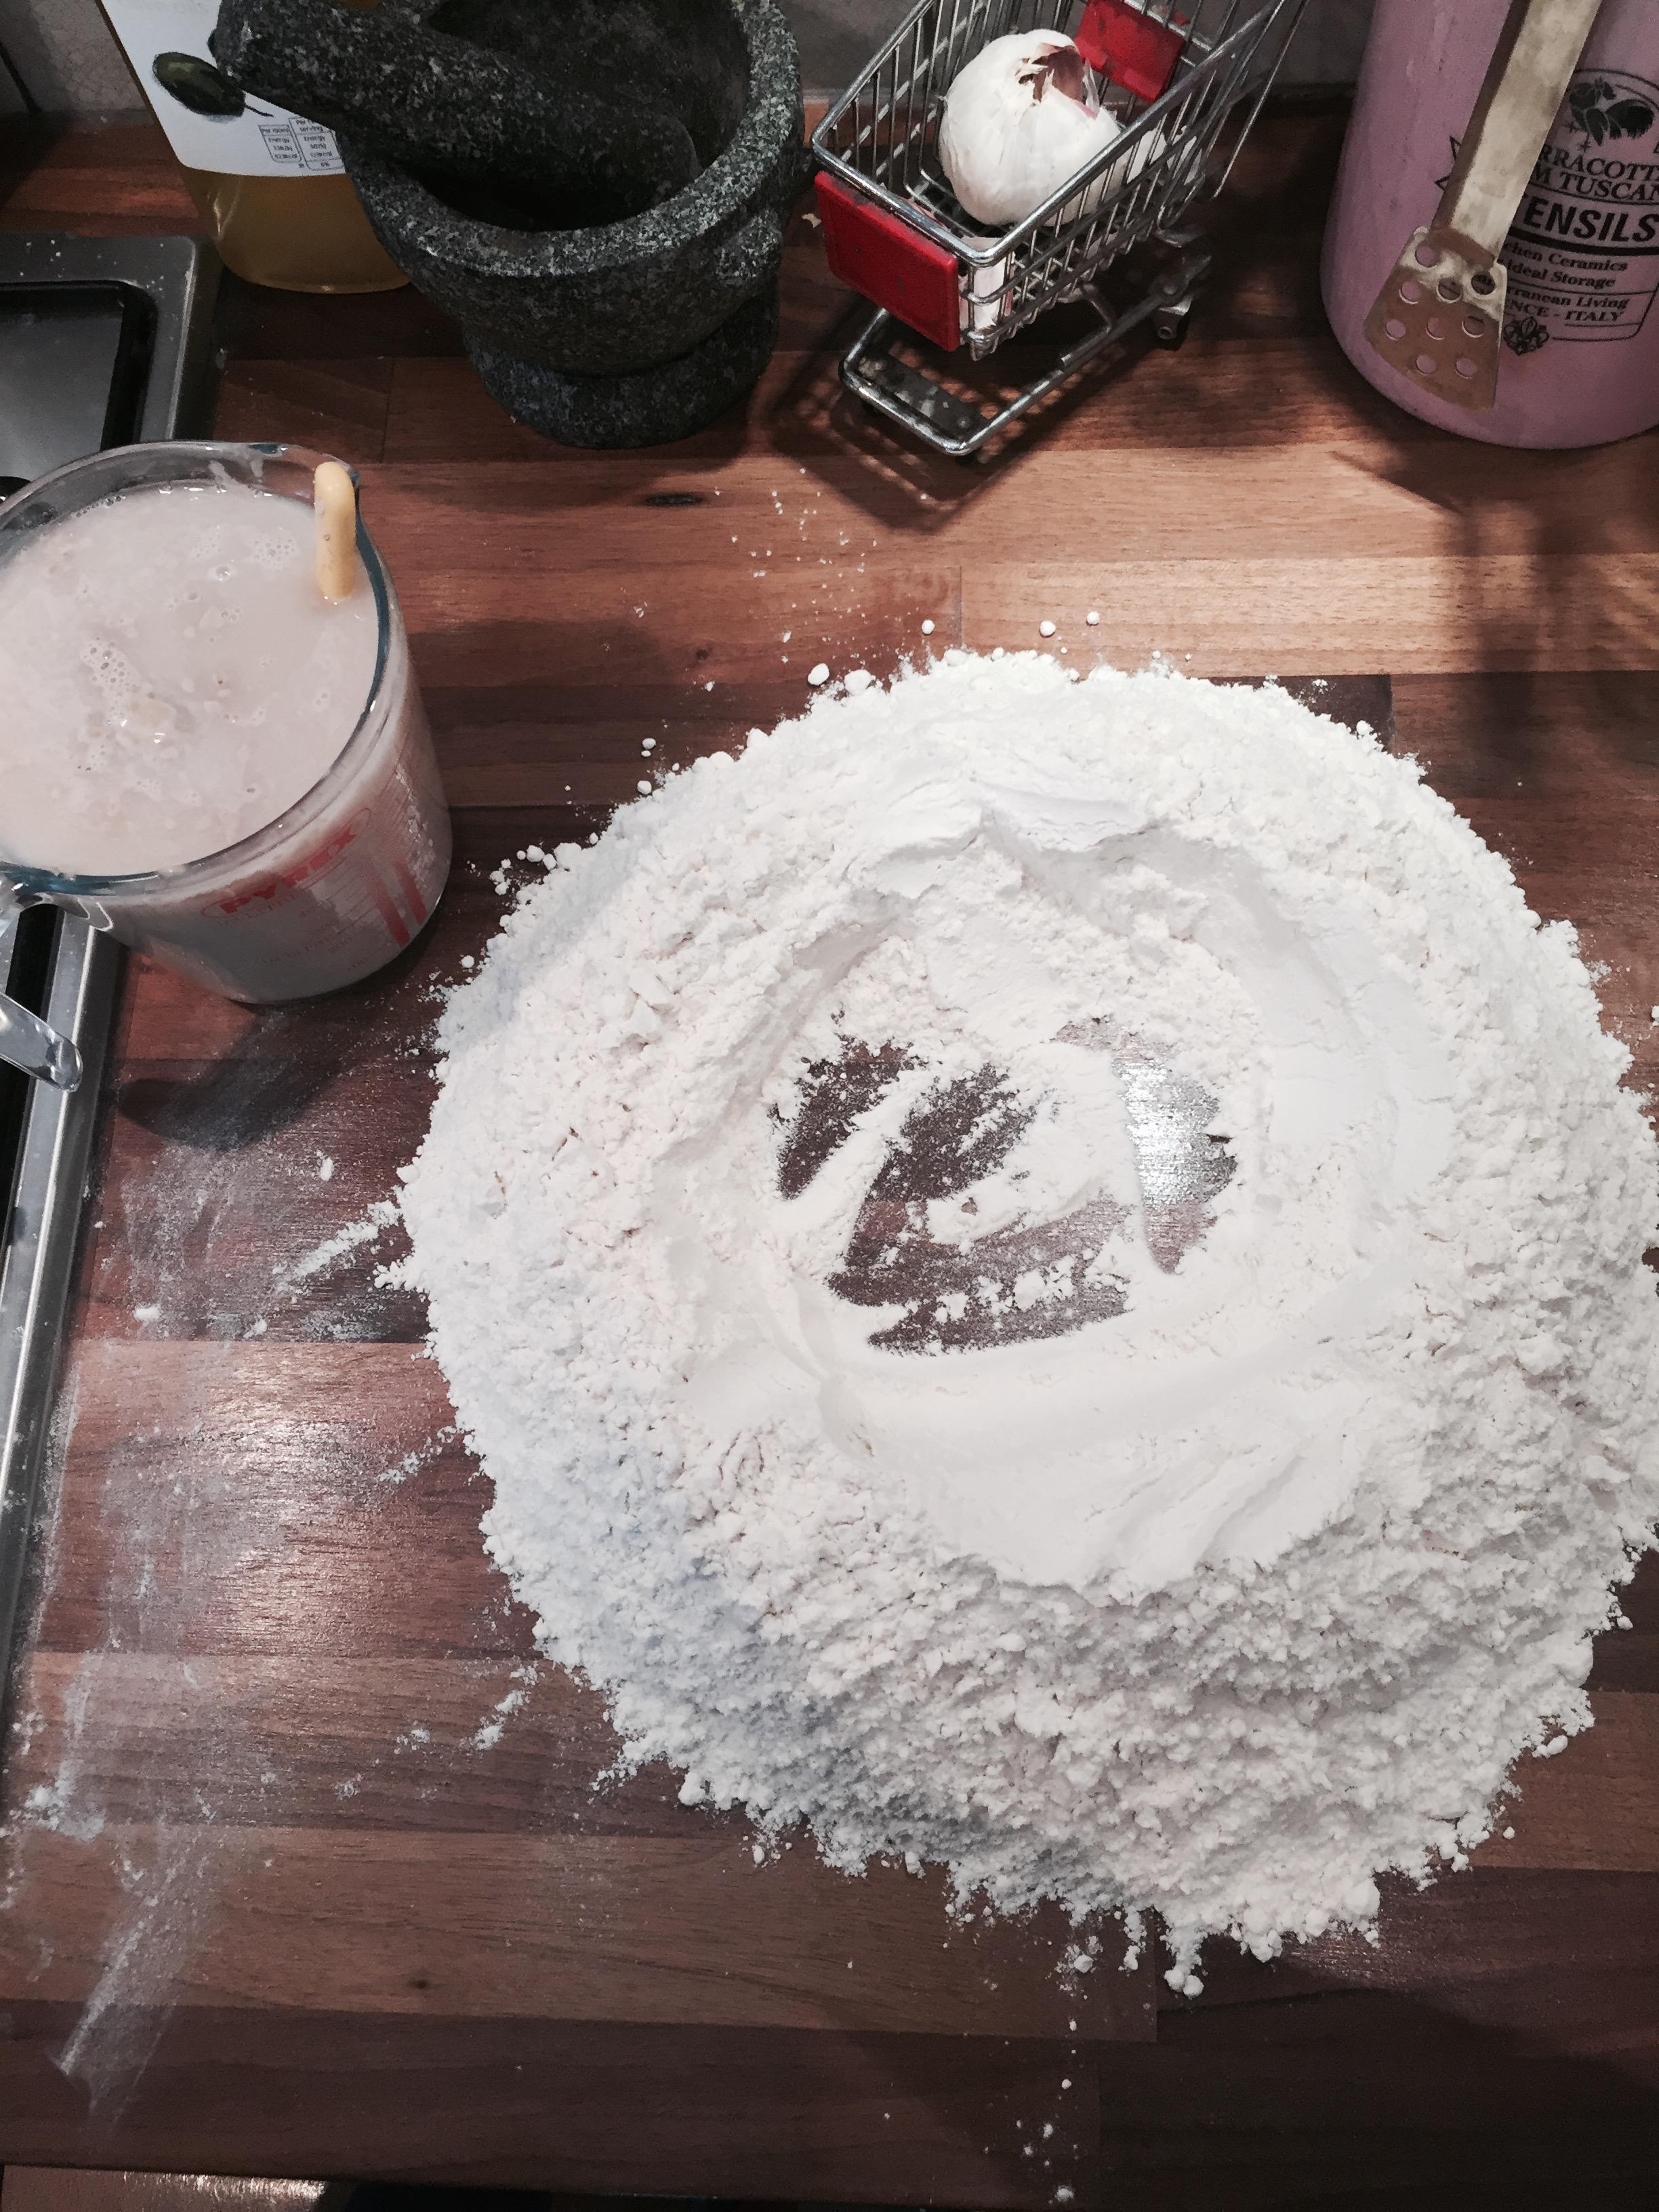 The Flour Well... More like Flour Hell!!!